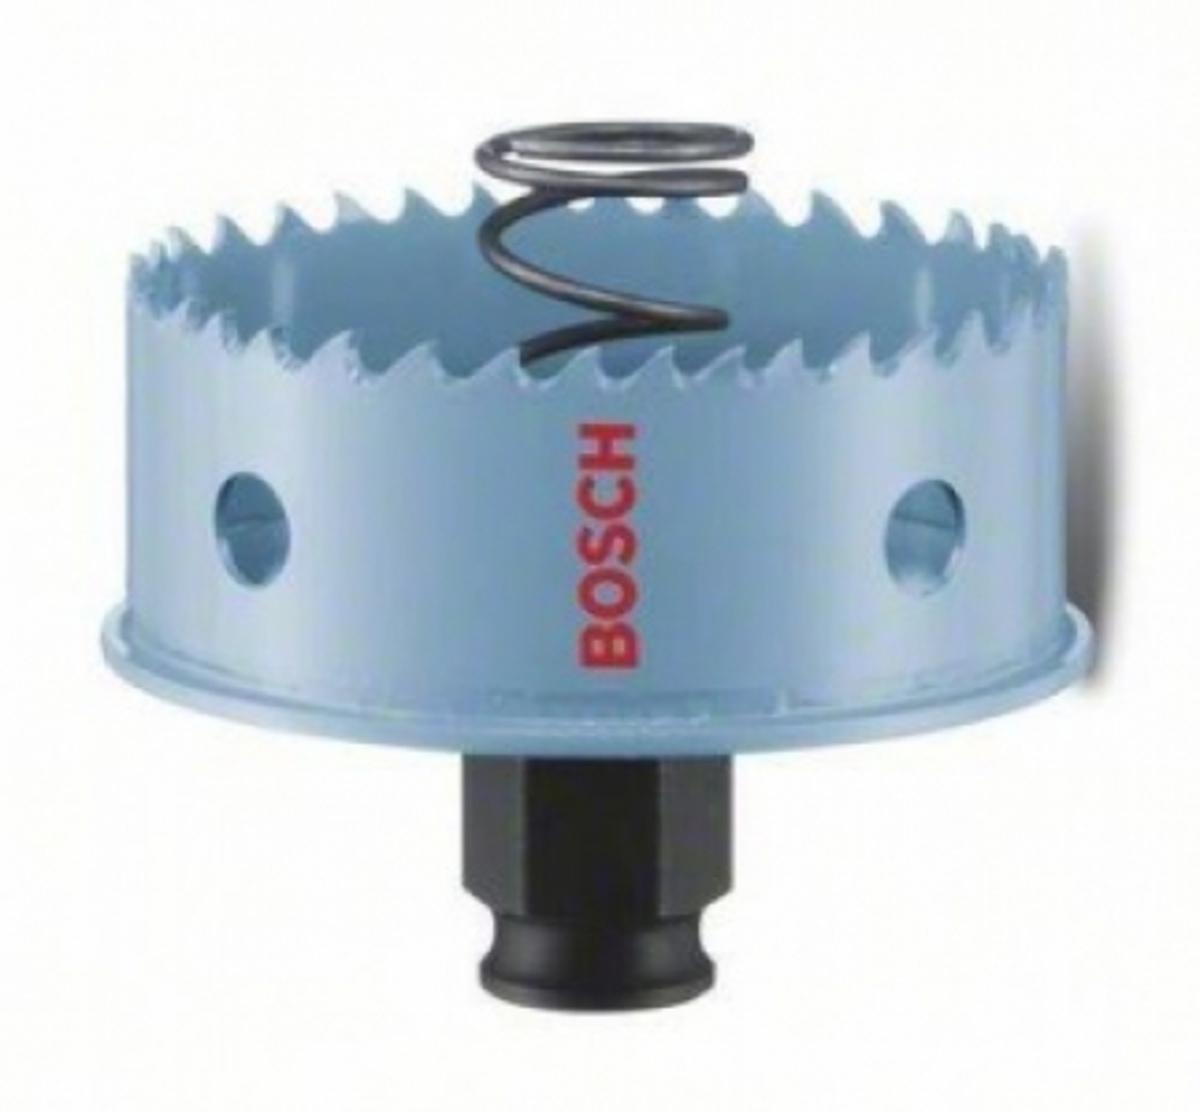 SERRA COPO BIMETAL HSS 54mm BOSCH